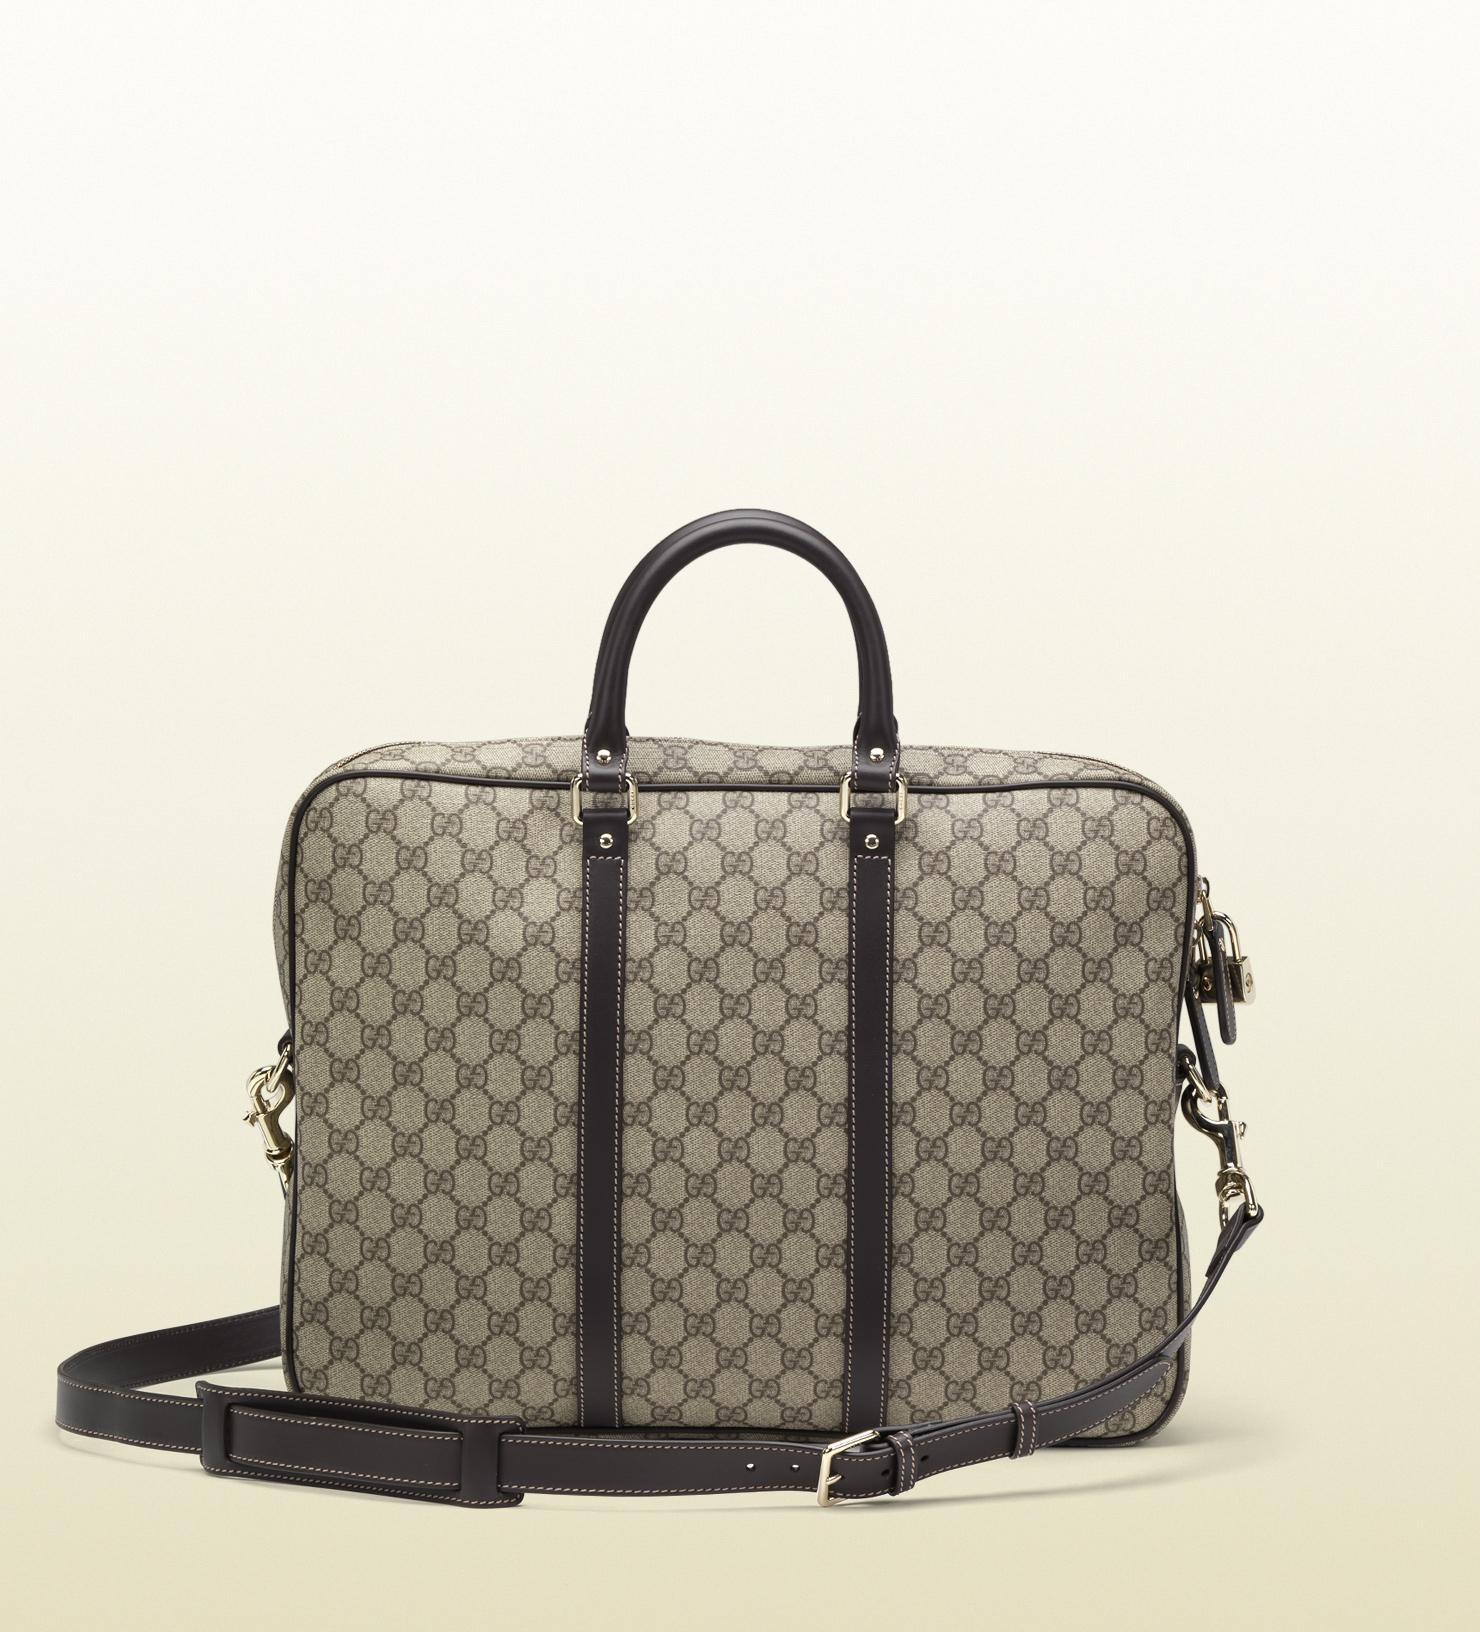 gucci brief Gucci men's diamante leather large briefcase bag 208468 dark brown by gucci (guccio gucci) $1,29500 $ 1,295 00 prime free shipping on eligible orders.